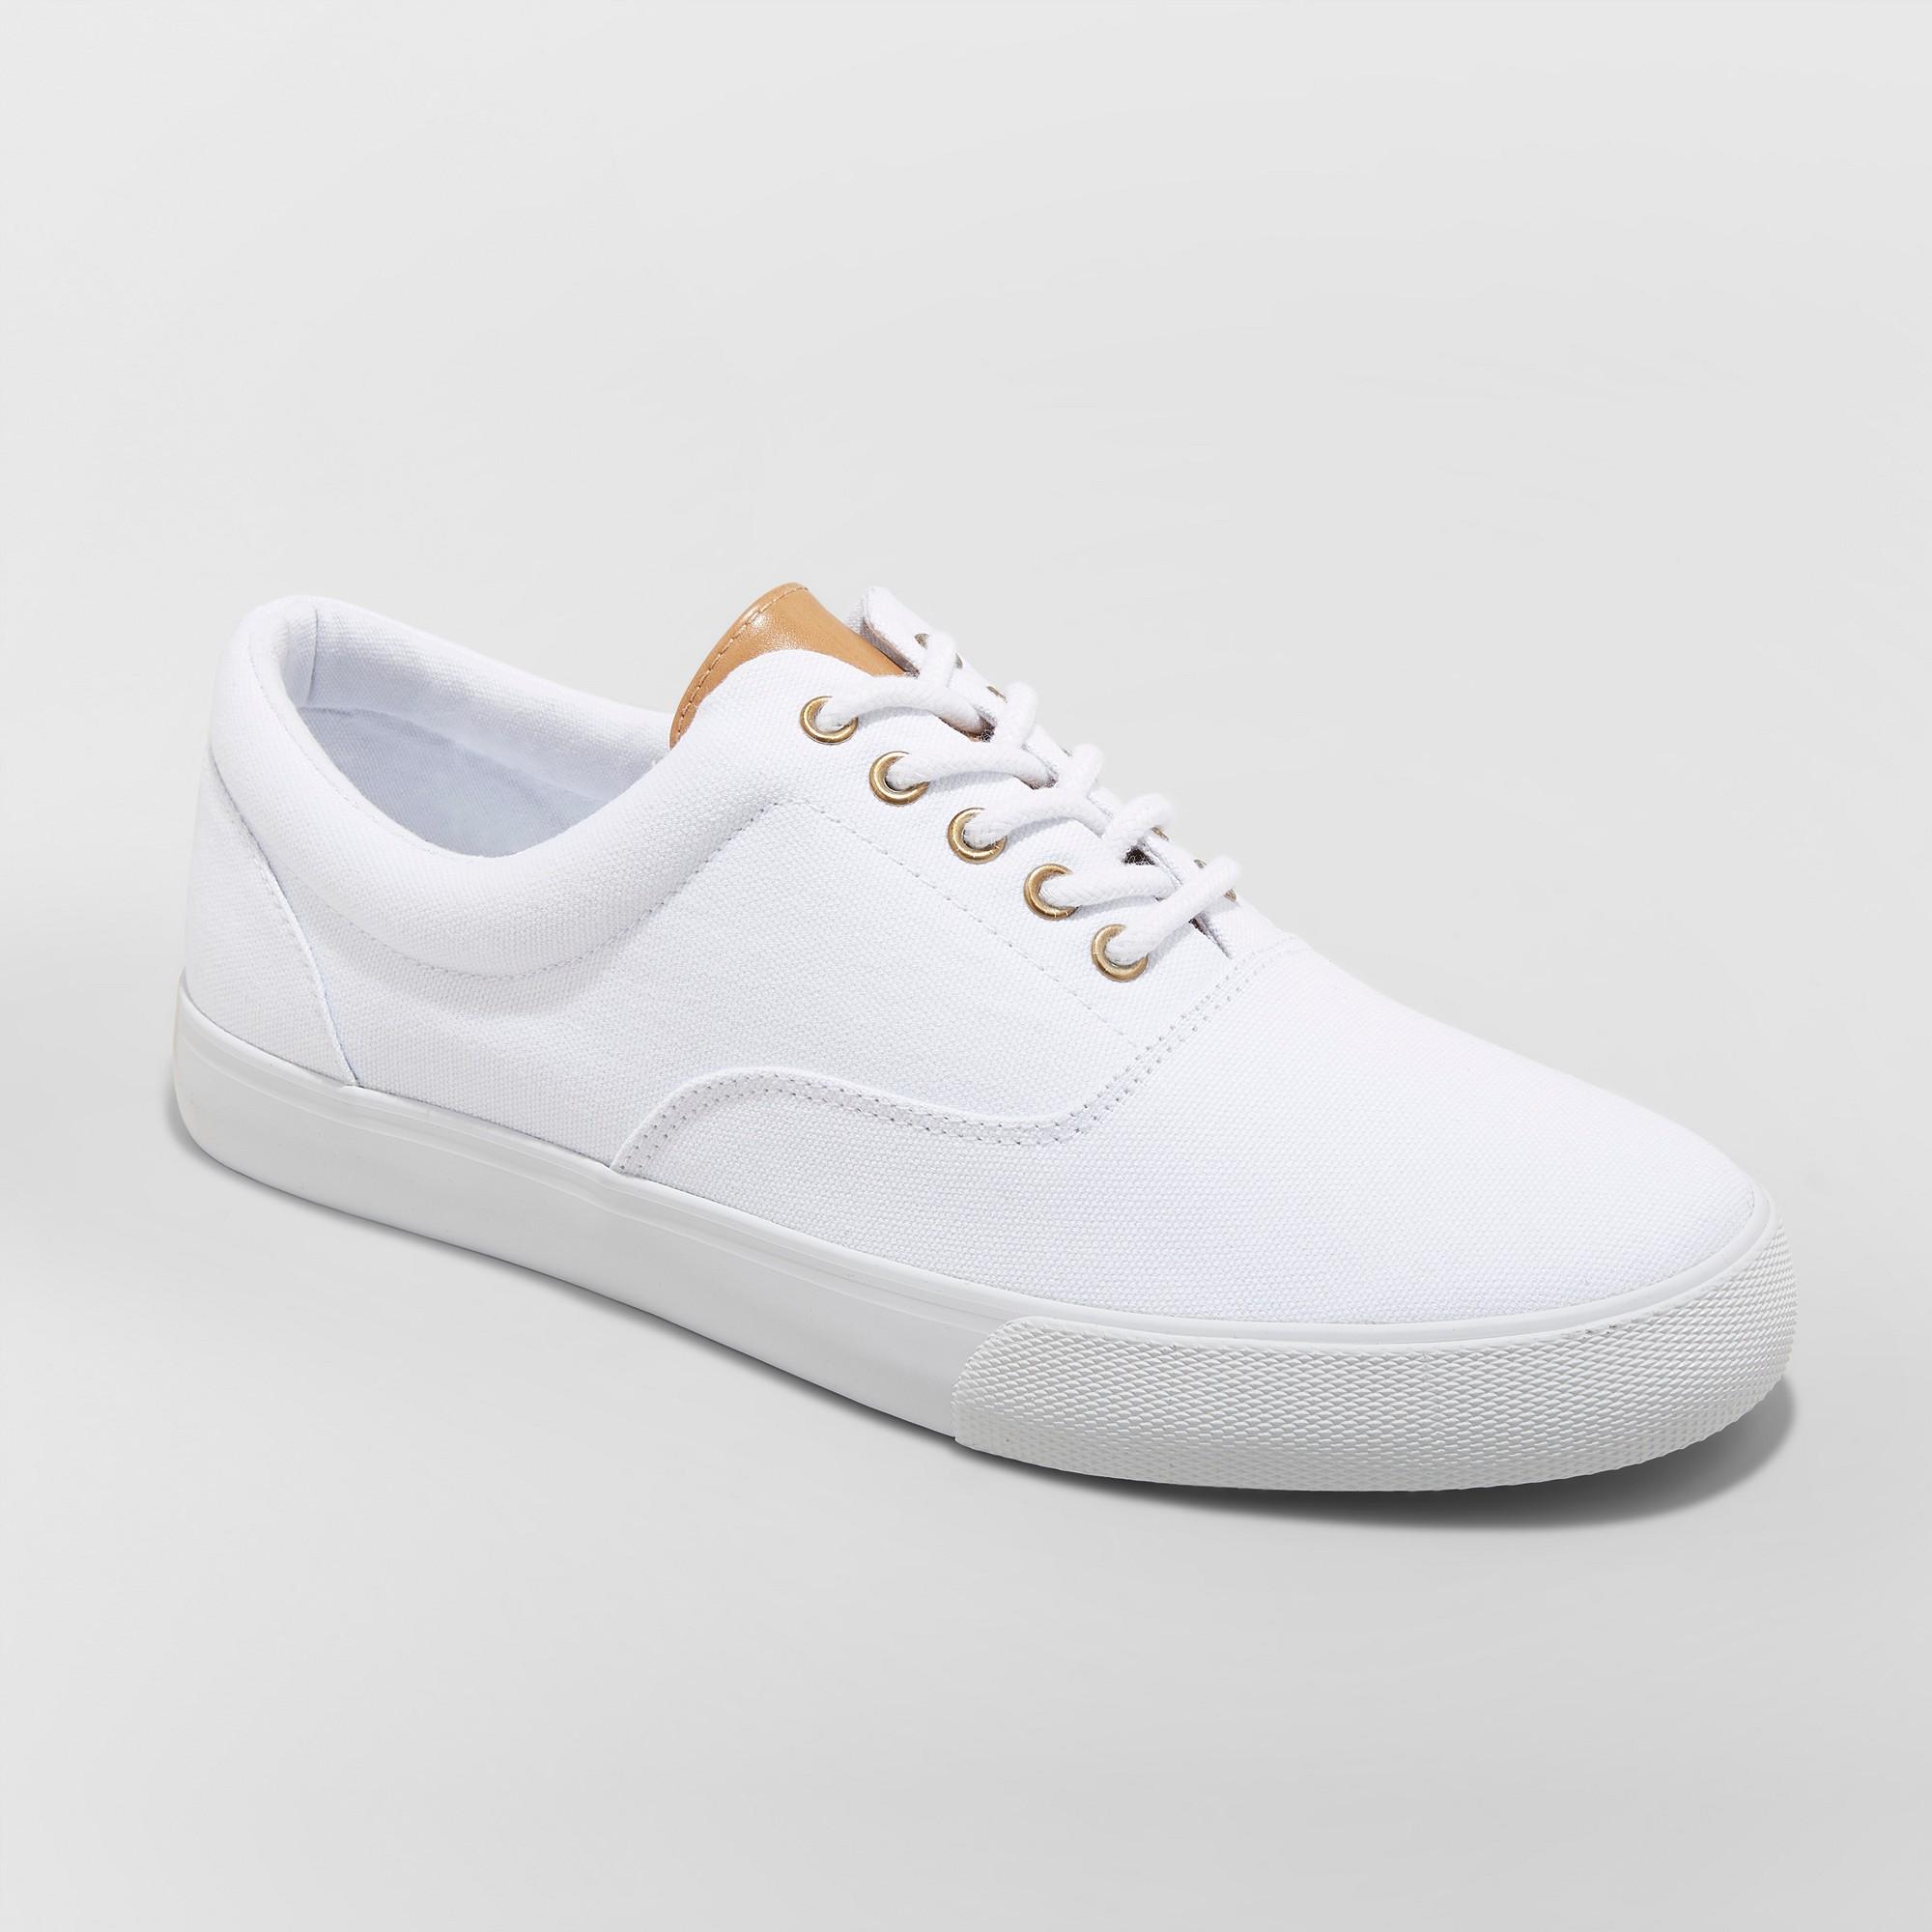 Men's Park Sneakers - Goodfellow & Co White 9